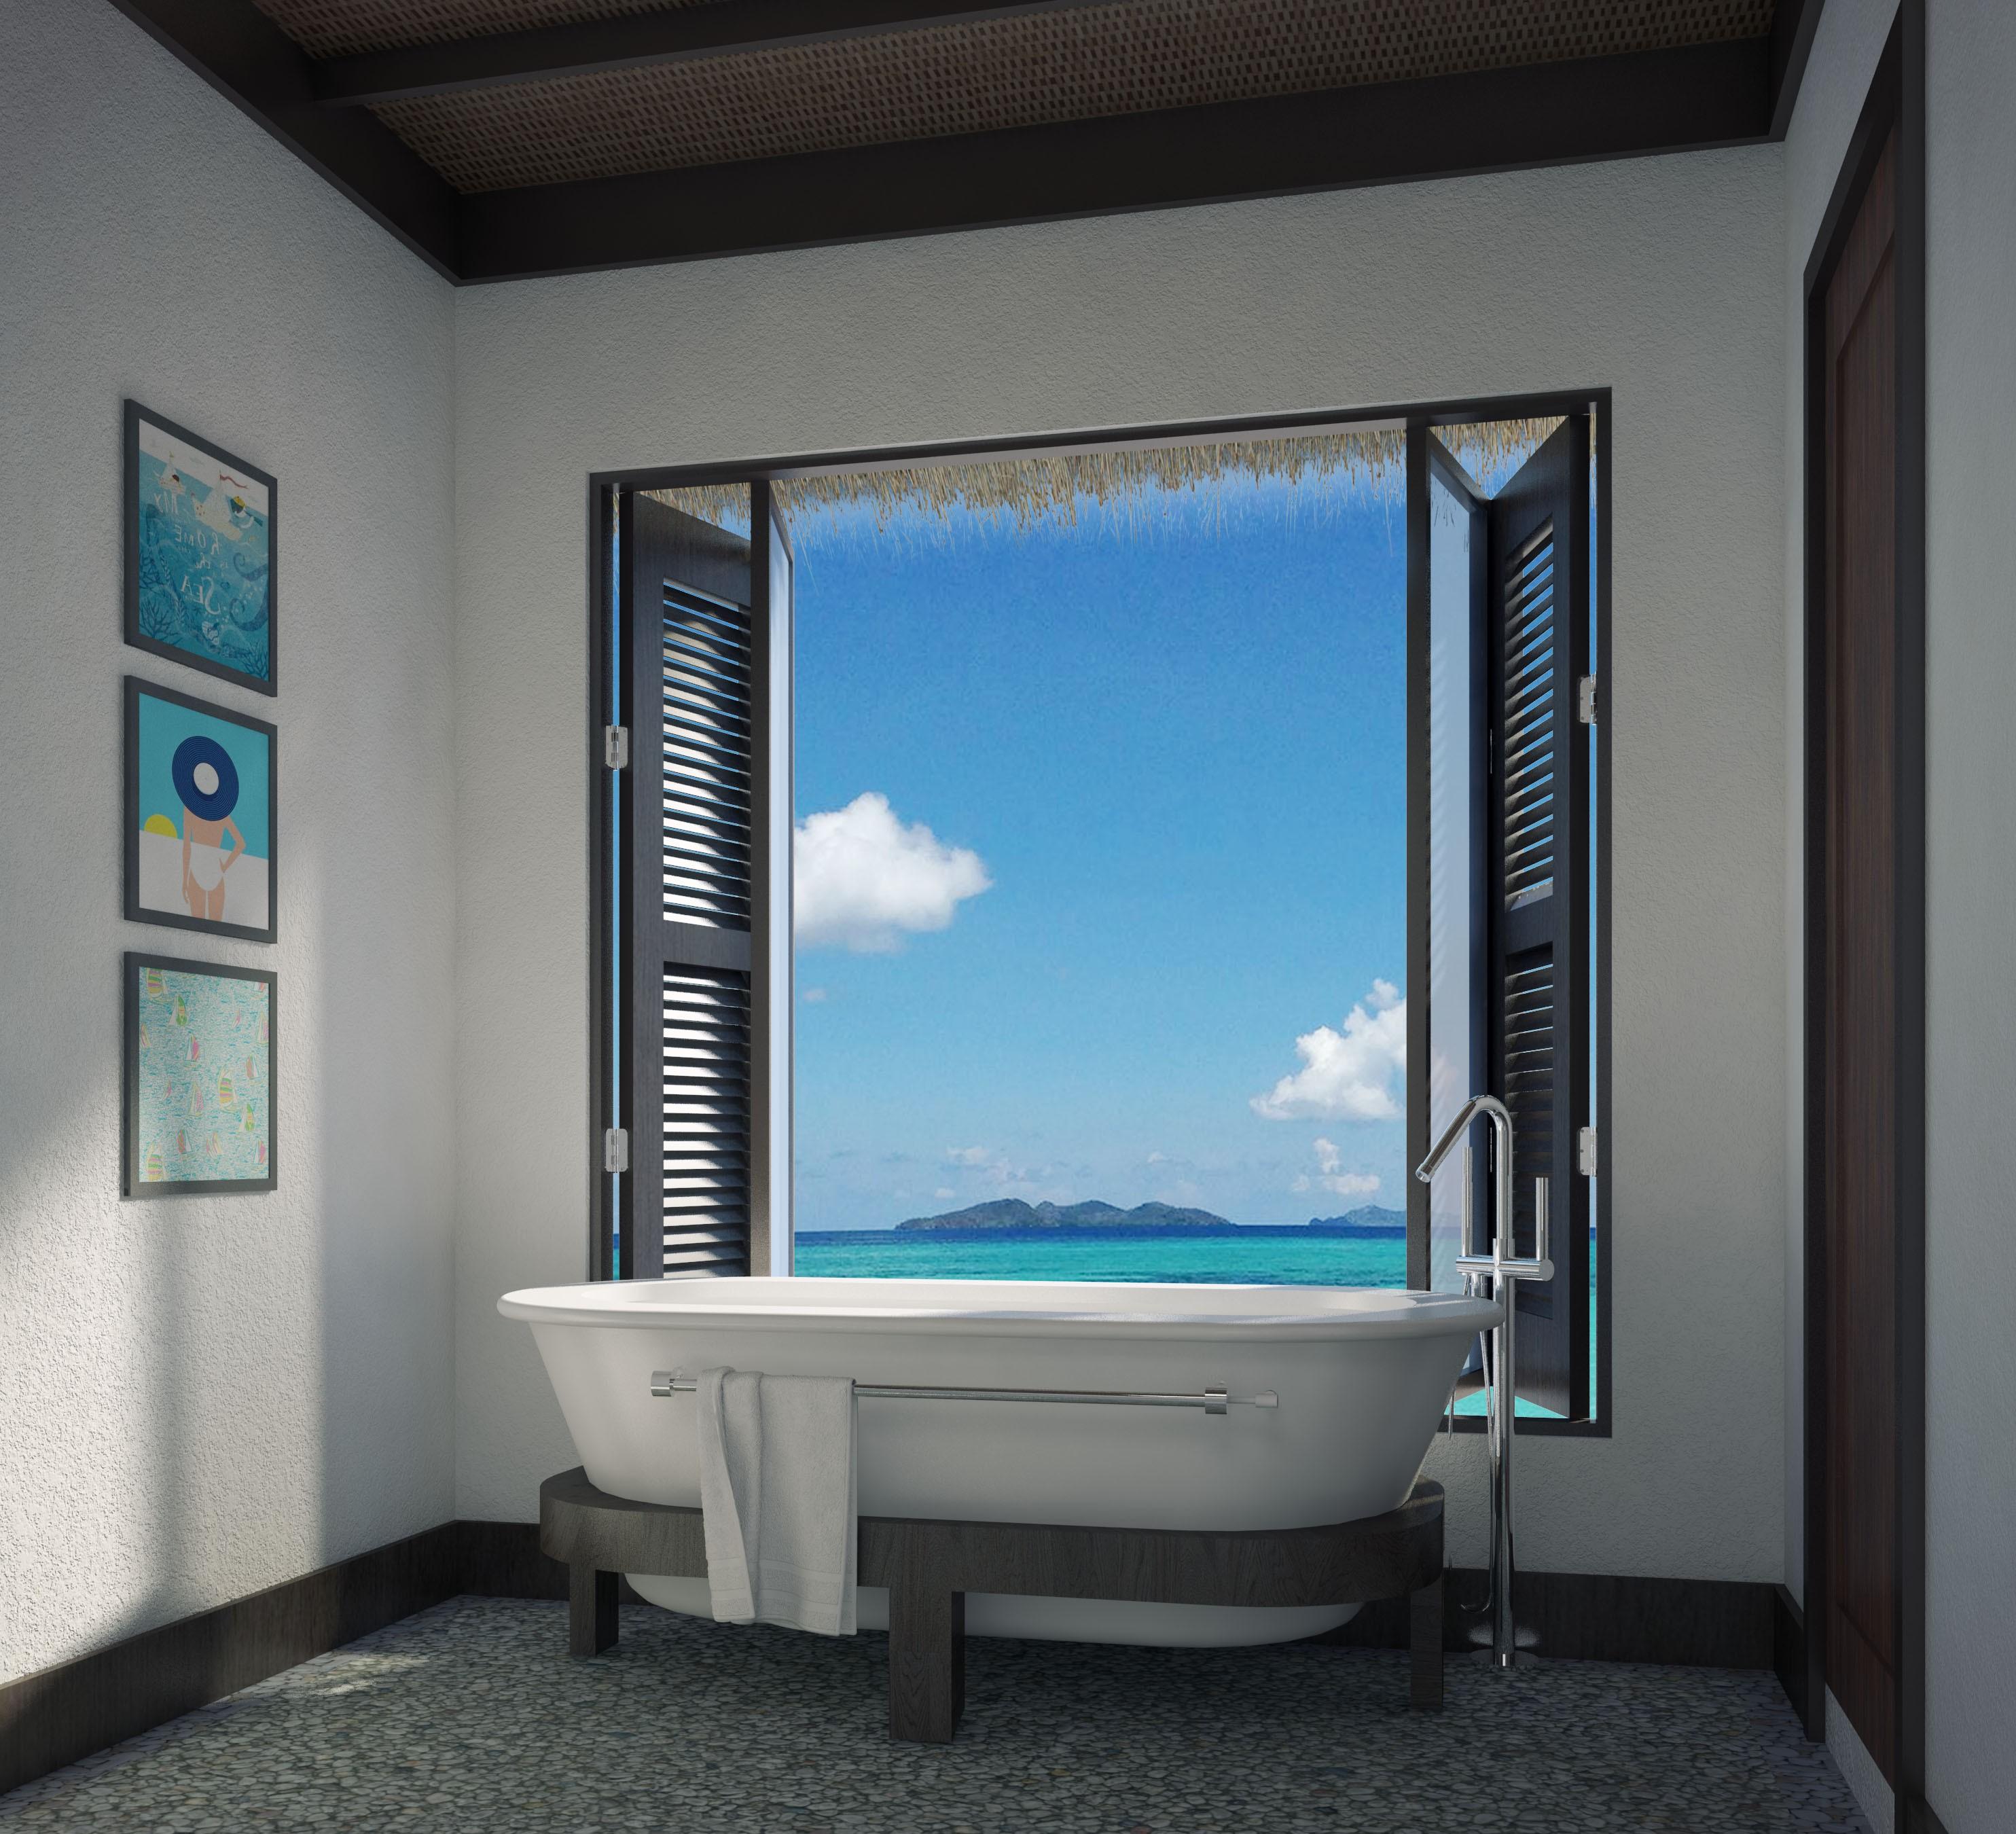 Qlistings - El Nido Beach Resort Property Image